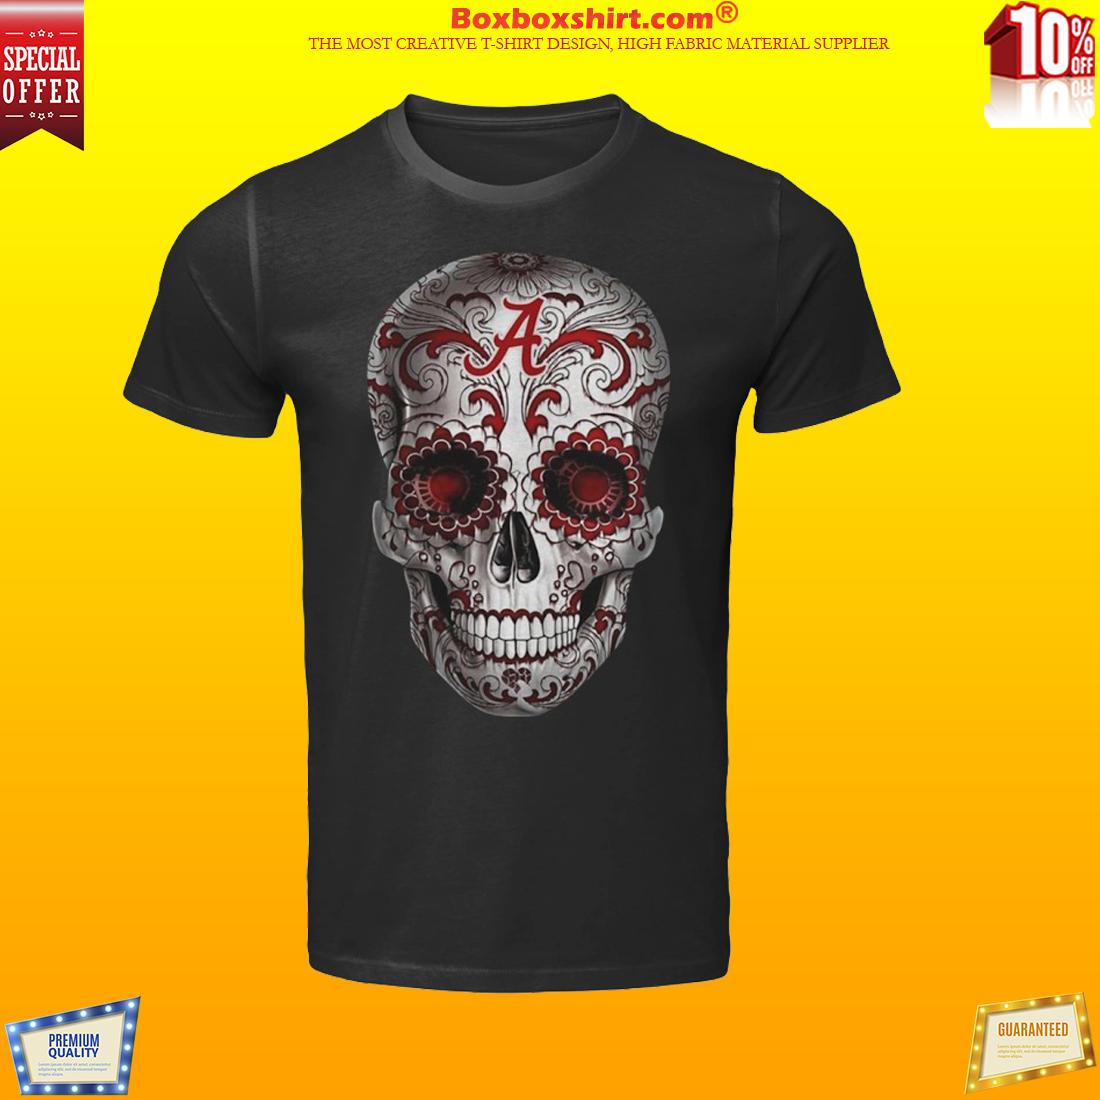 Alabama sugar skull shirt